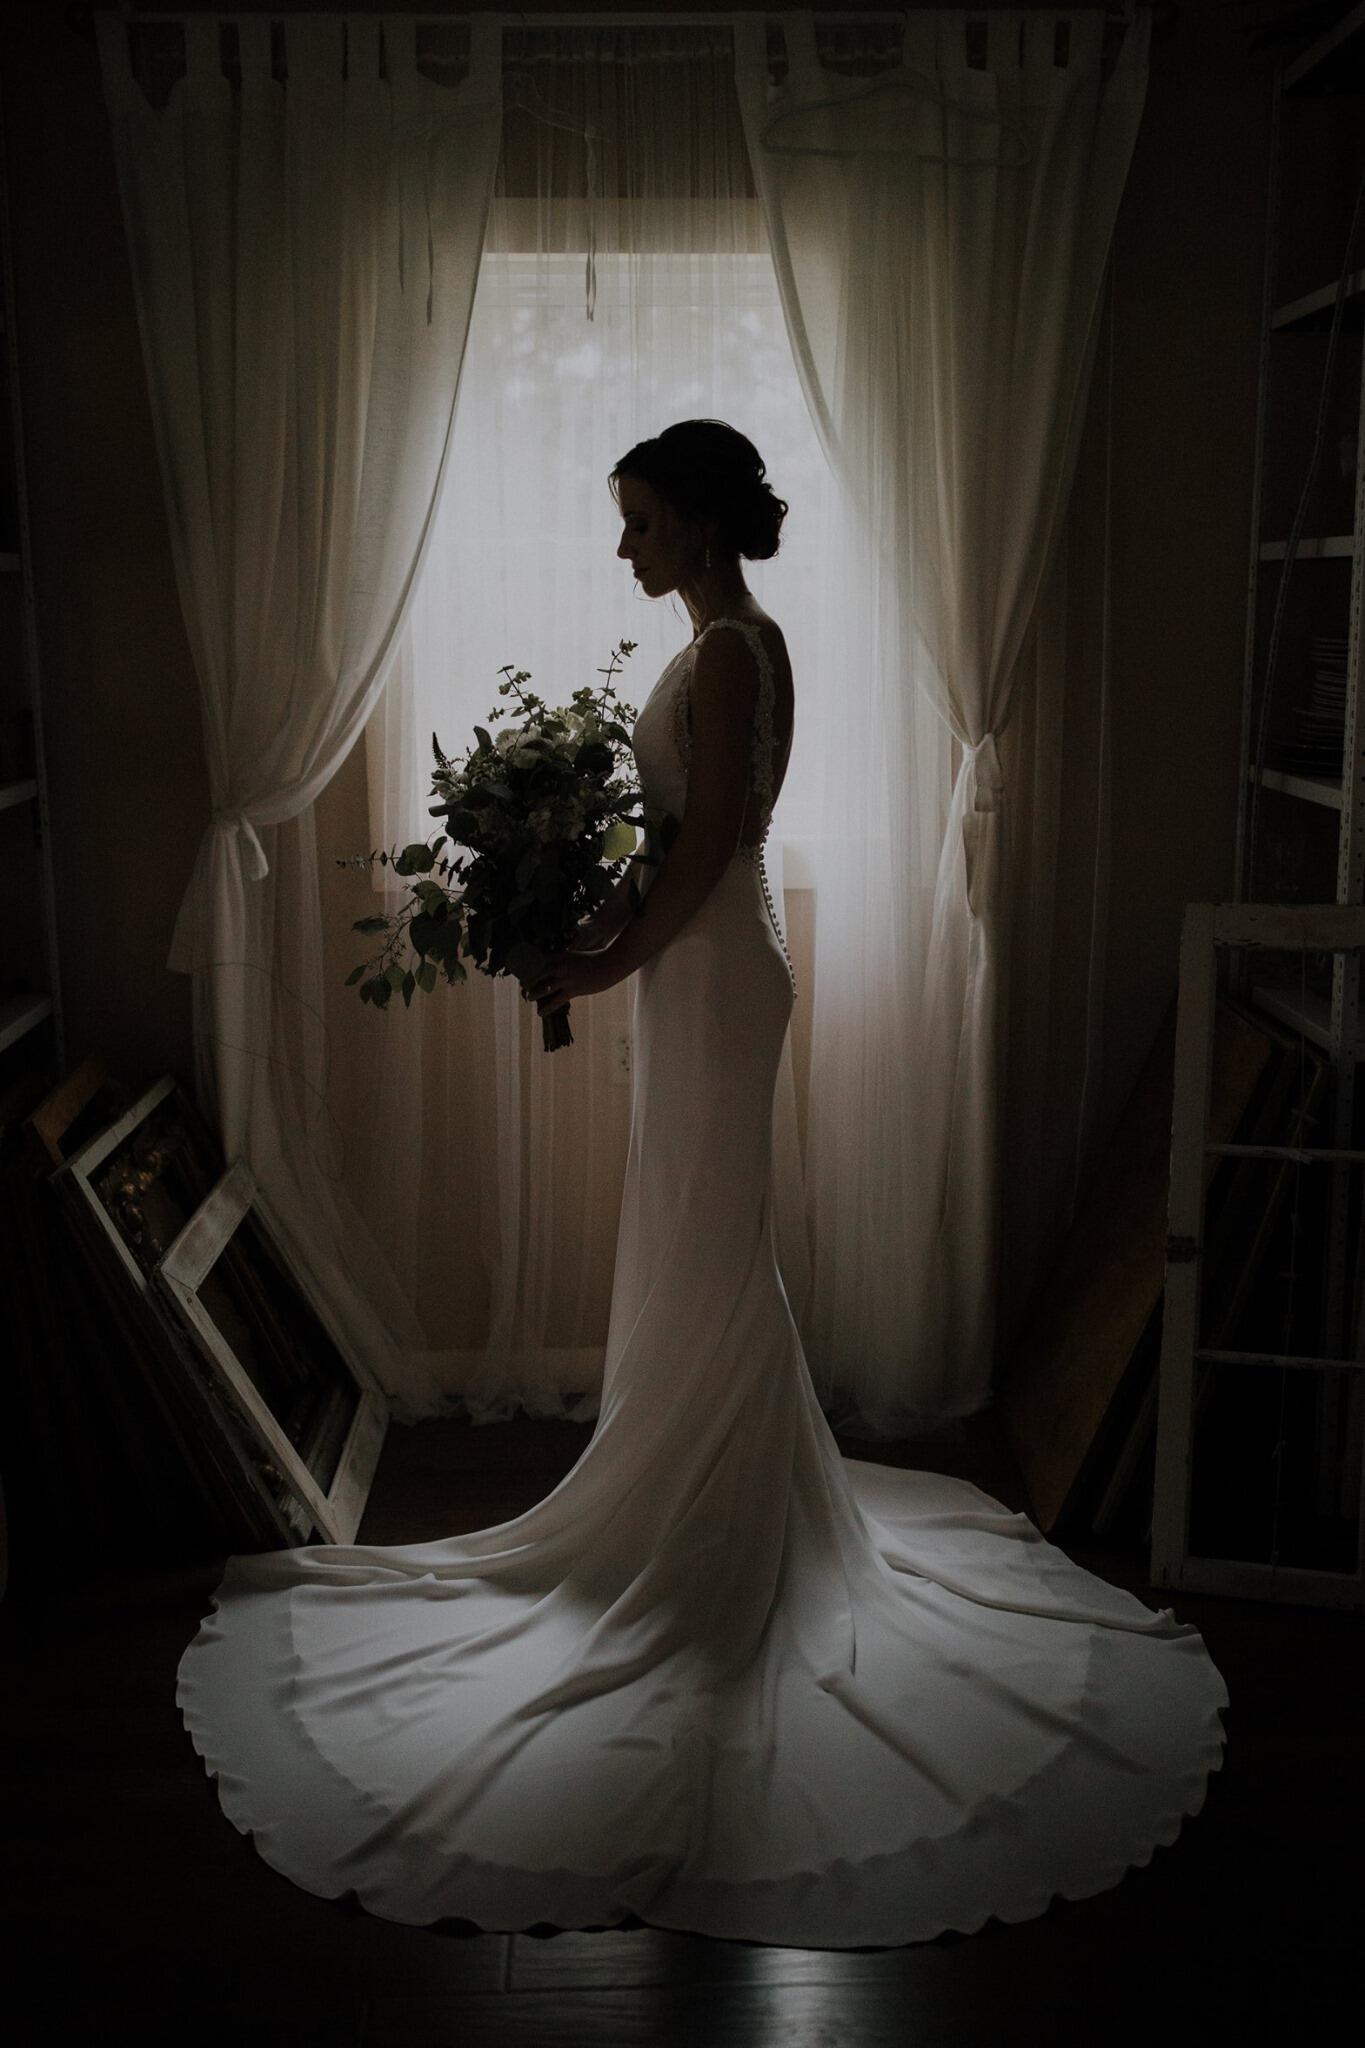 100 Instagram Captions for Weddings